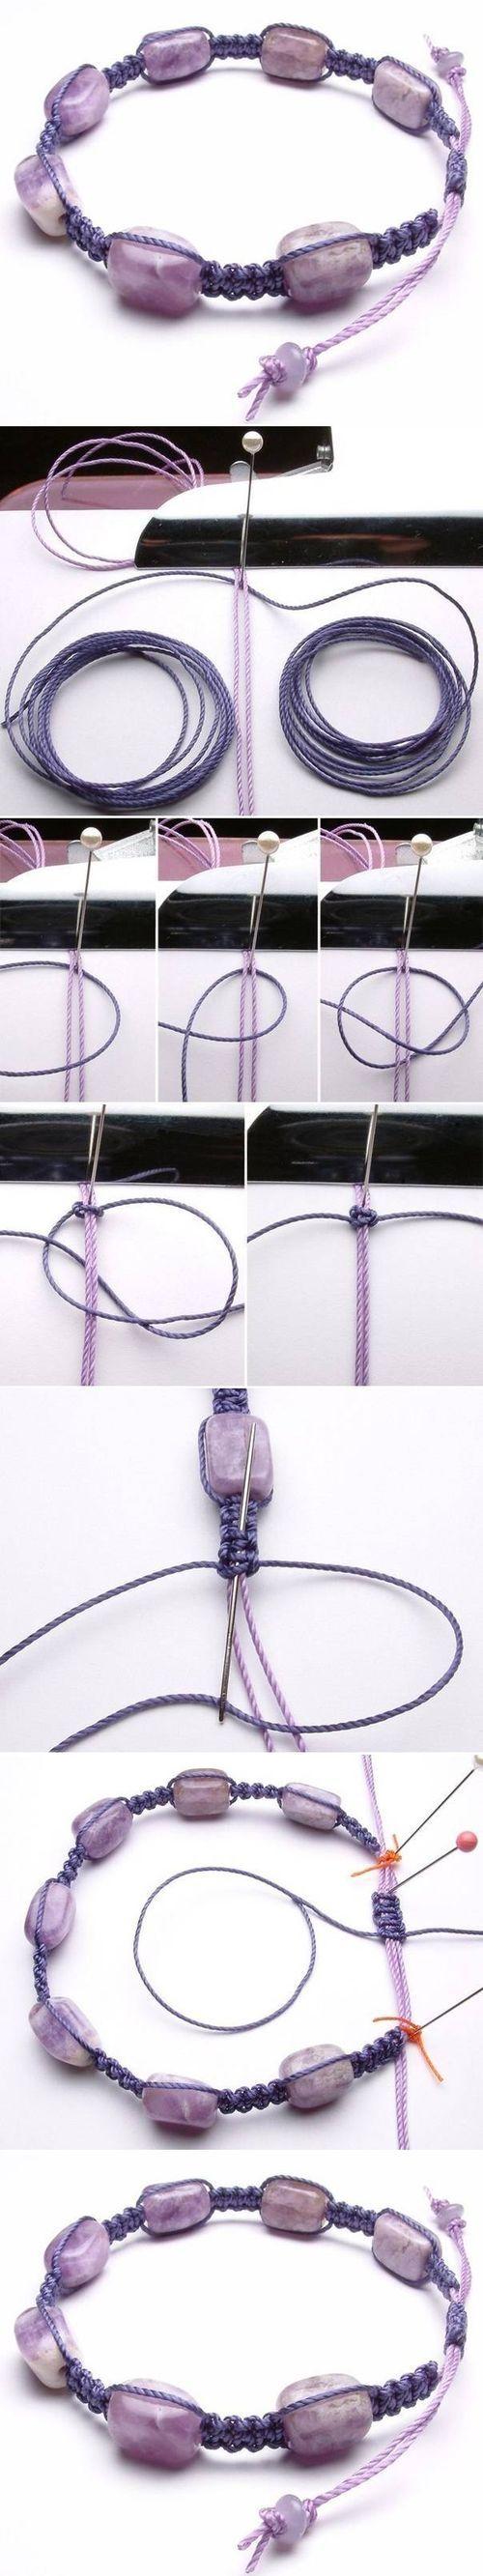 pictures of slide clasp for bracelet